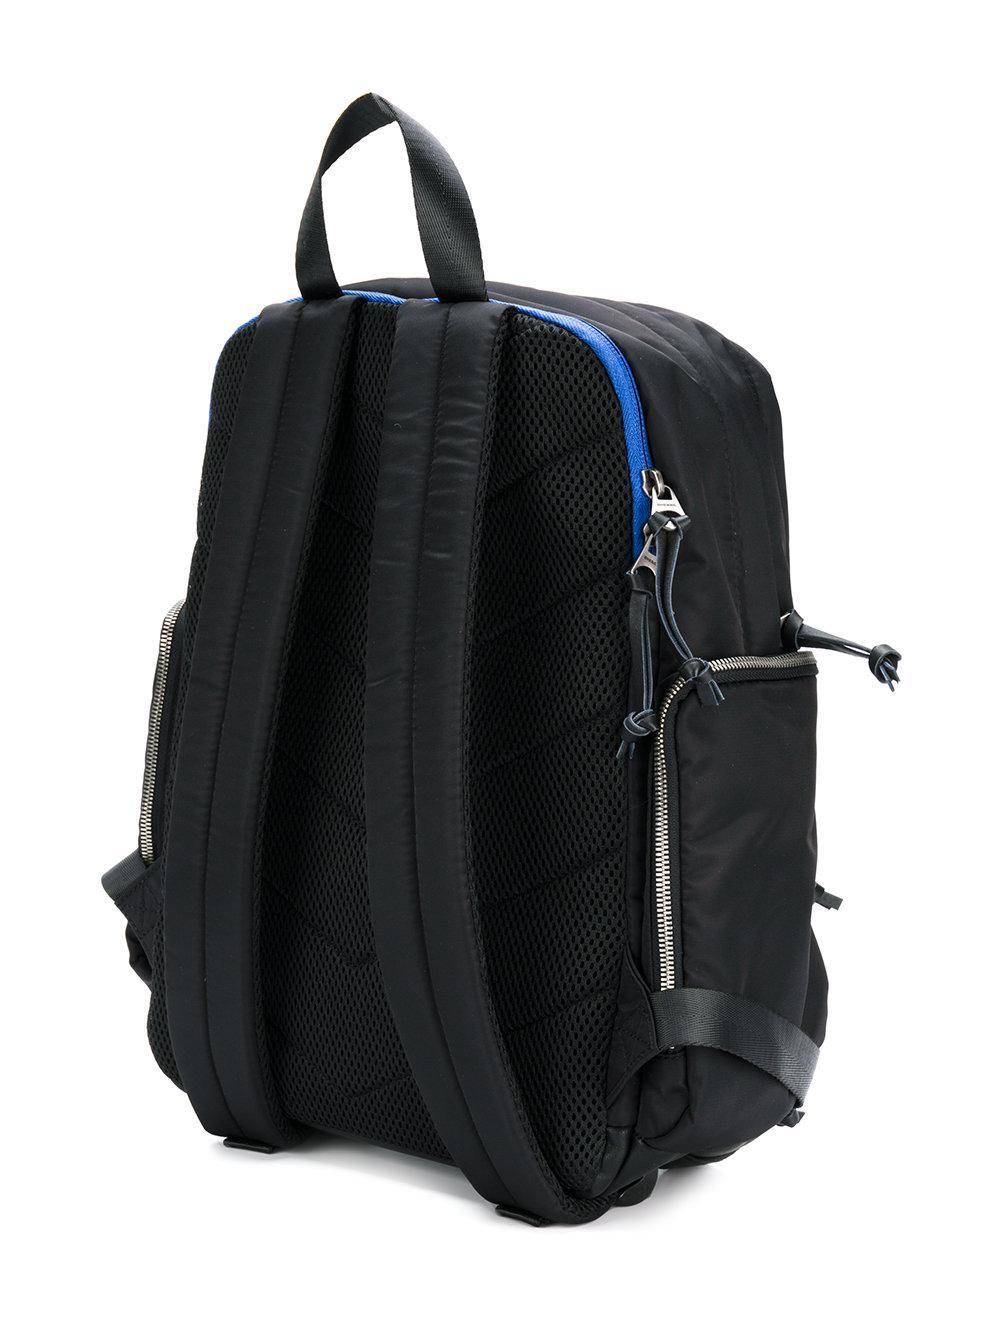 1f7d9034f3 Lyst - DIESEL Contrast Backpack in Black for Men